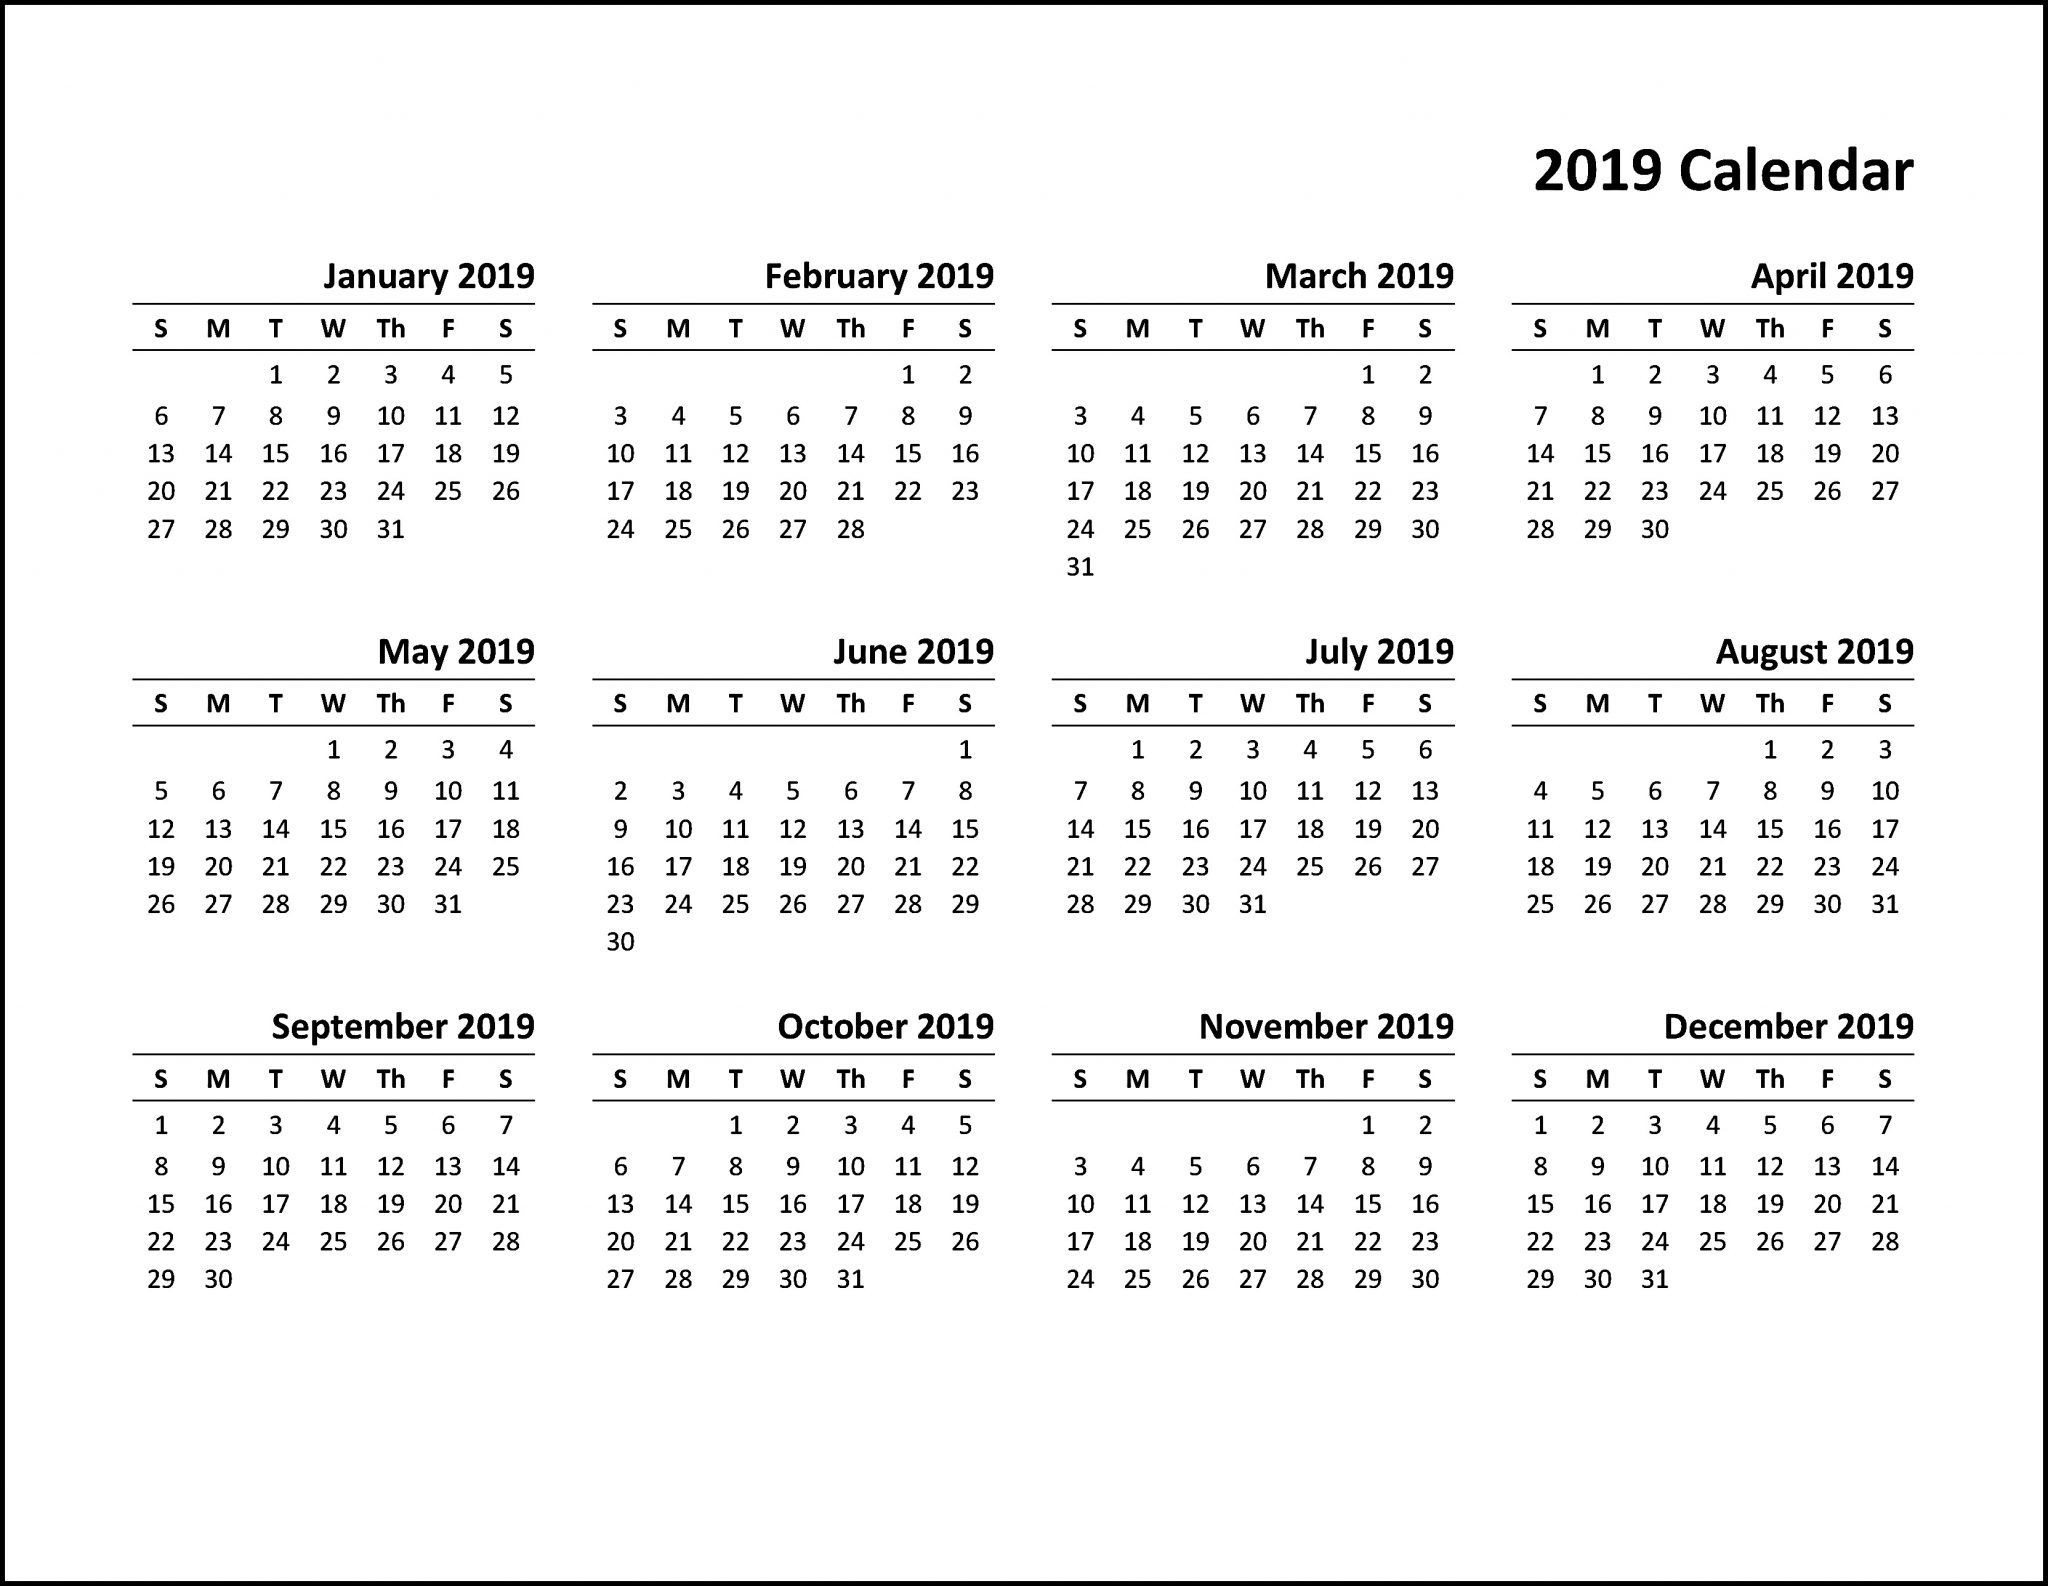 Printable Calendar 2019 Pdf | Calendar Template, Free  Checkbook Size Calendar Printable